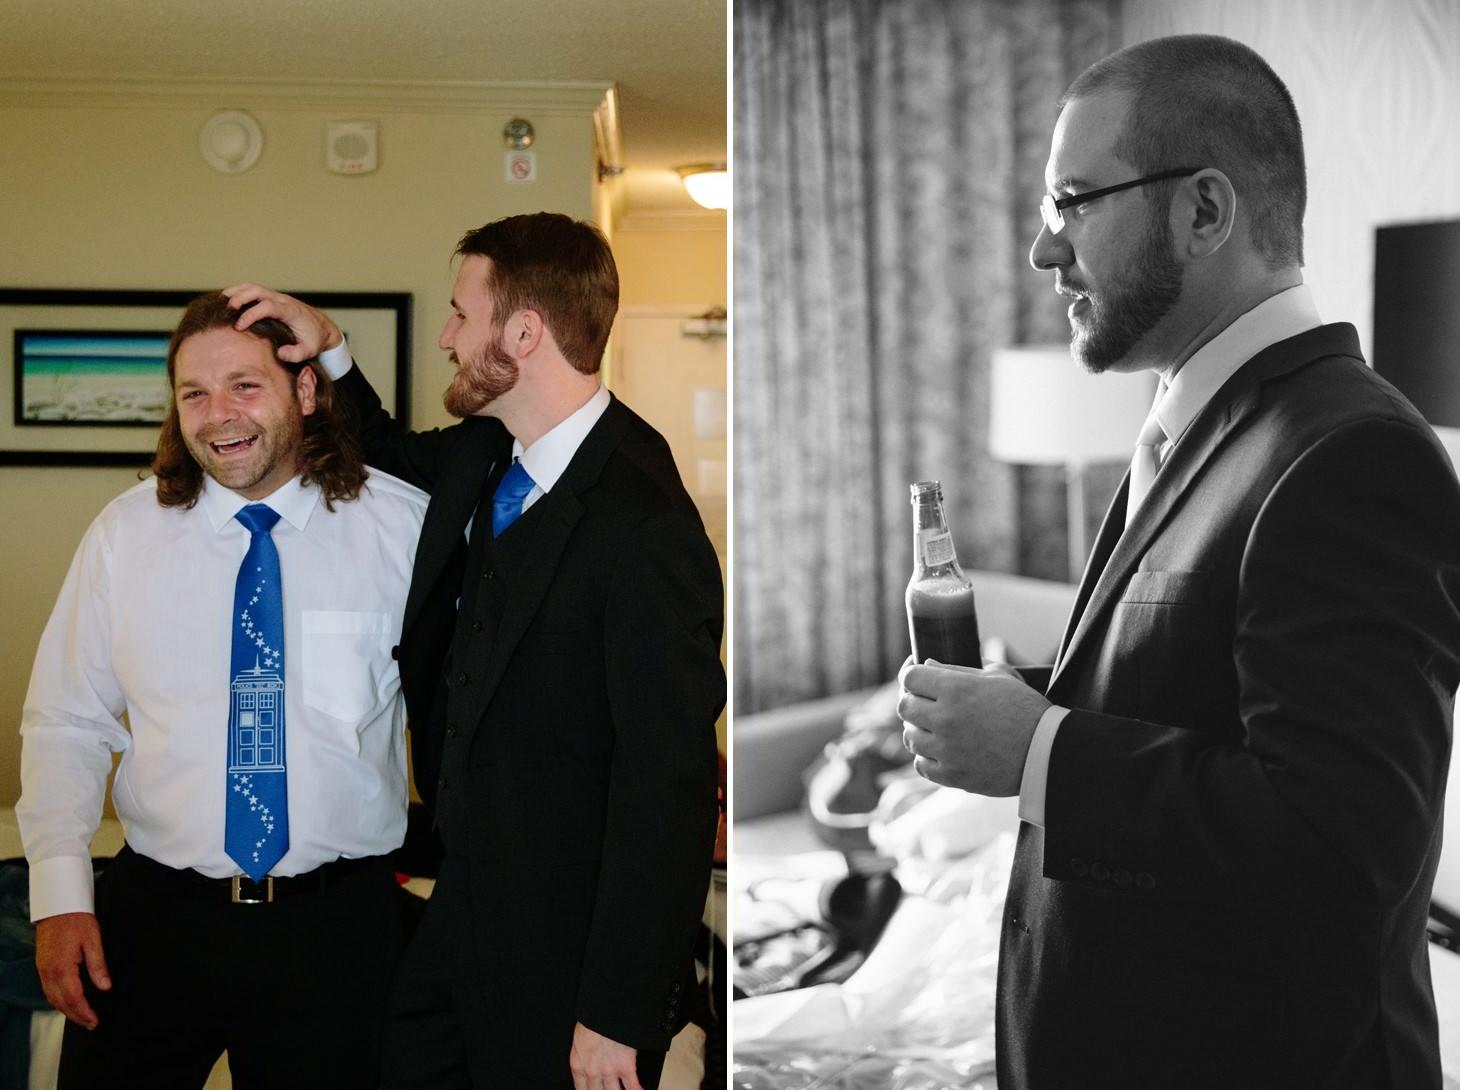 011-nyc-wedding-photographer-nj-nerdy-dr-who-firehouse-wedding-smitten-chickens.jpg